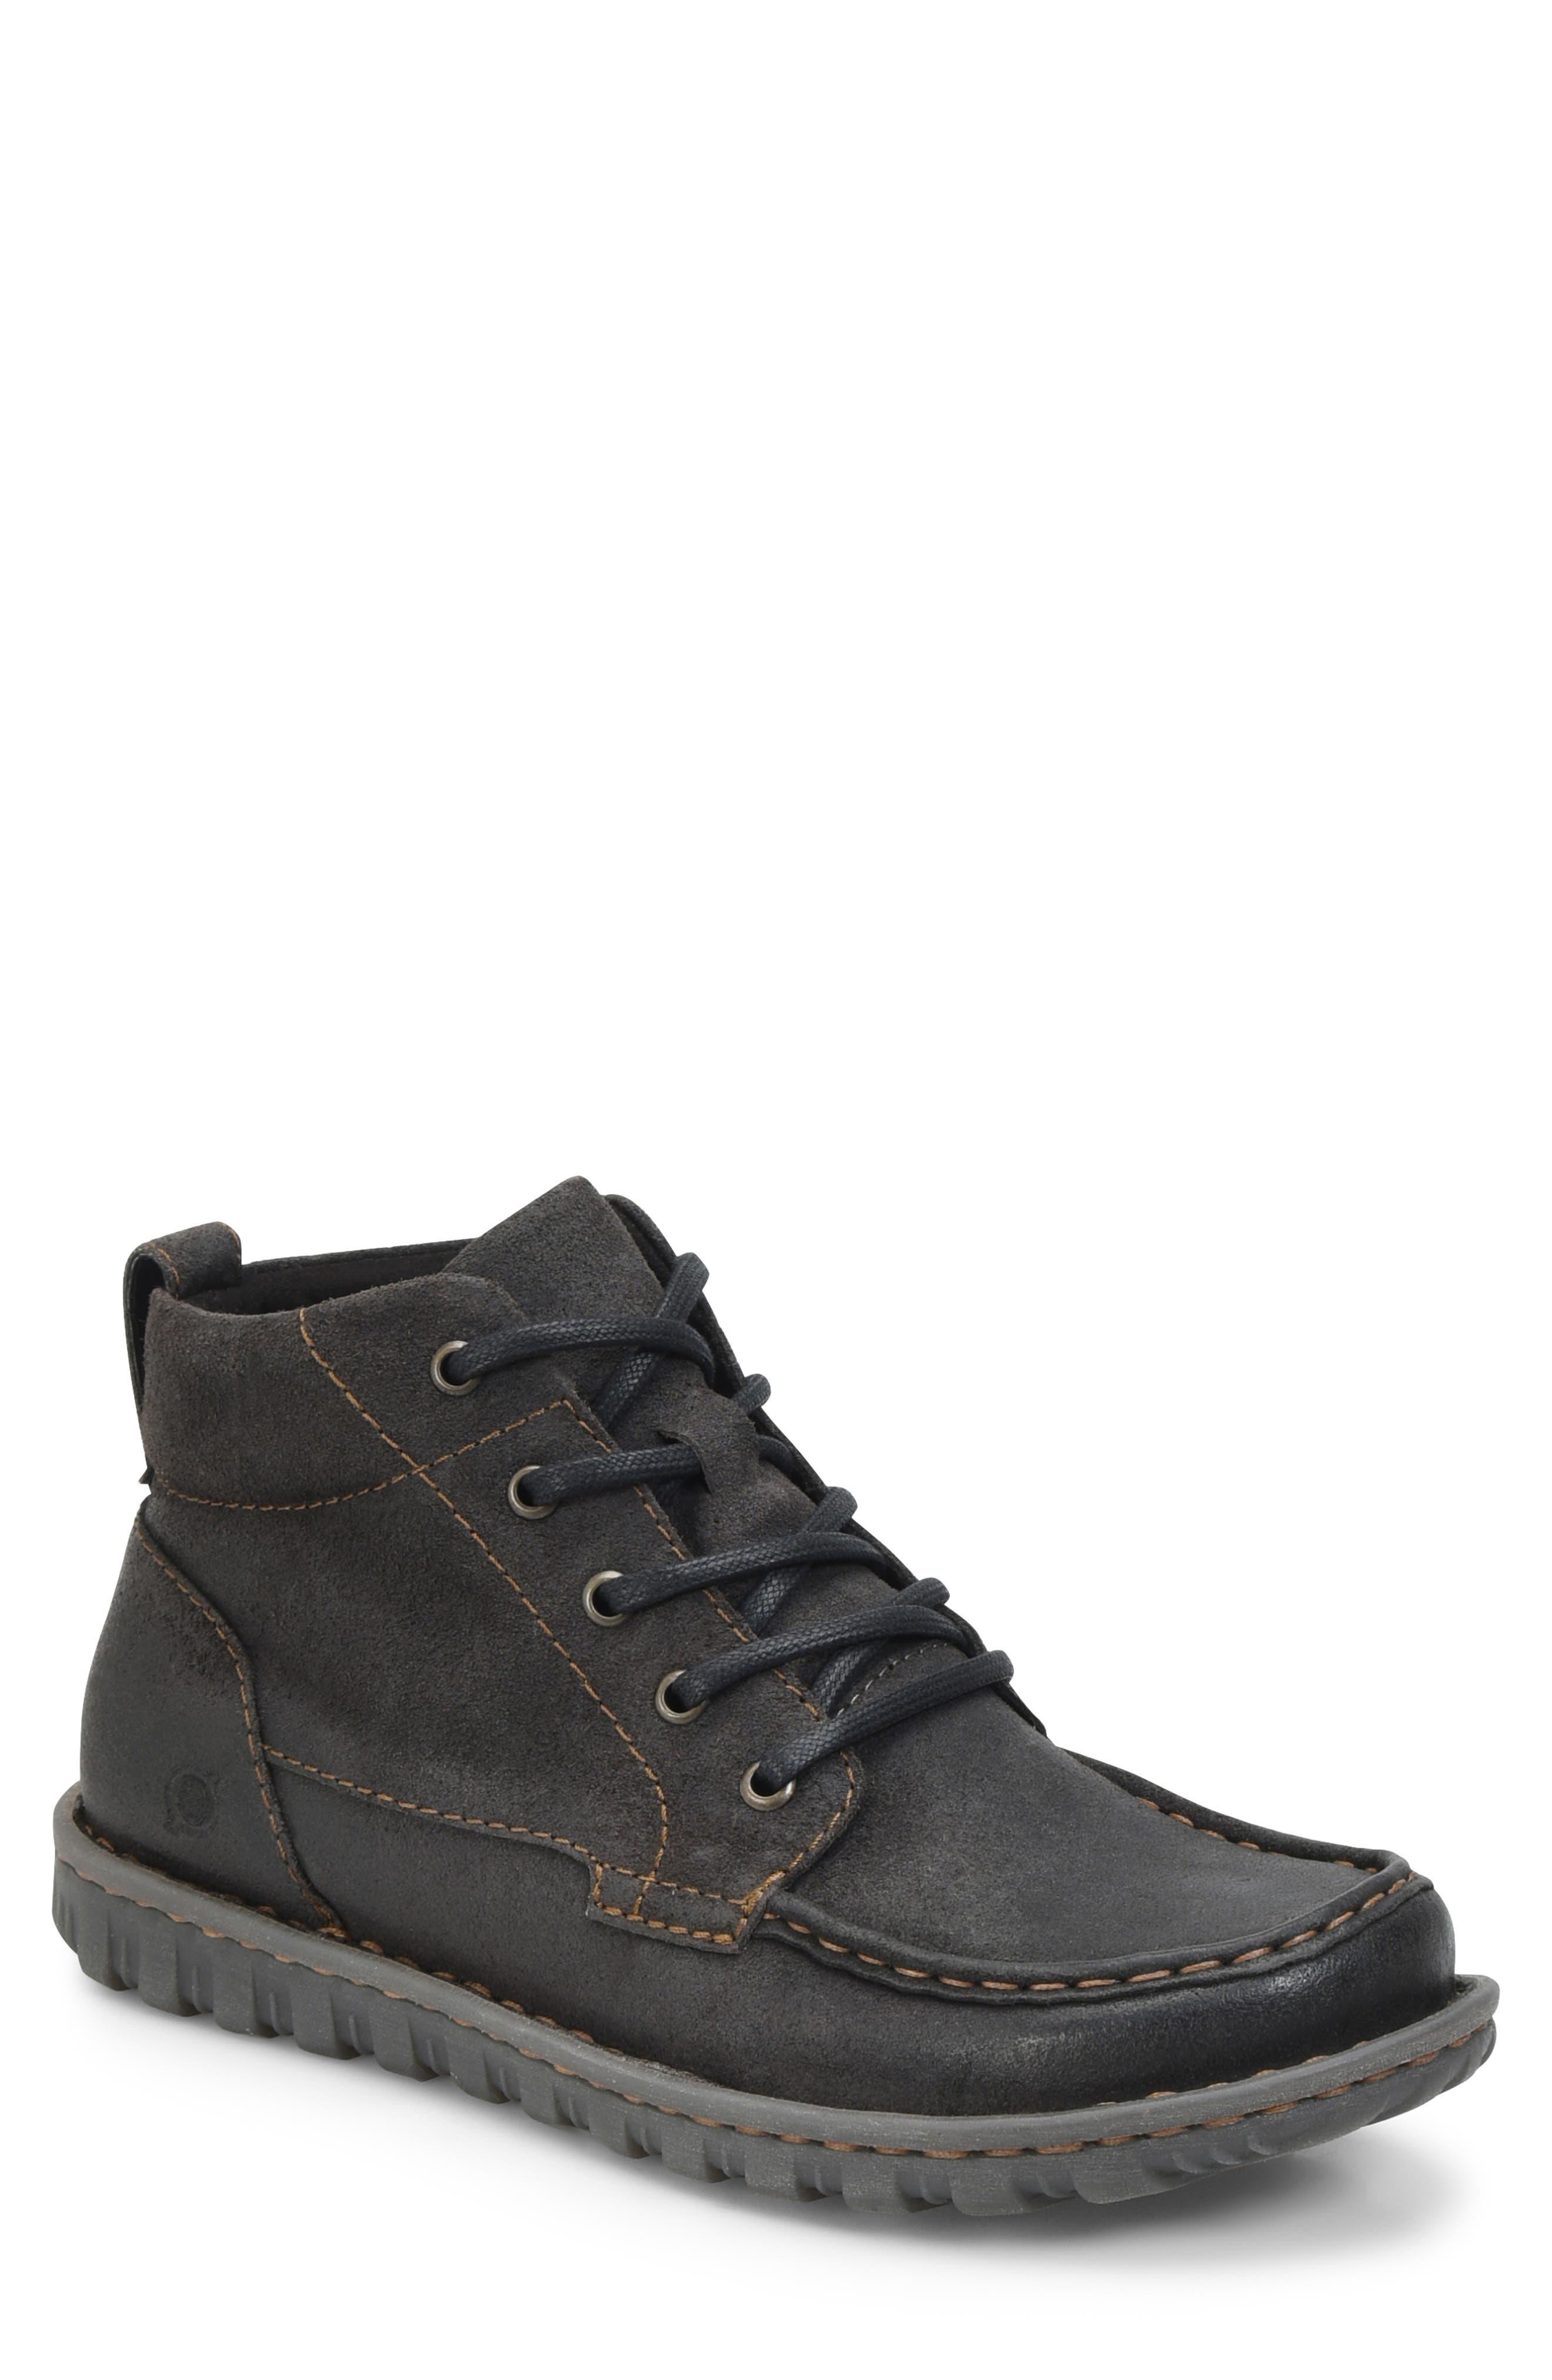 Gilden Moc Toe Boot,                         Main,                         color, DARK GREY LEATHER